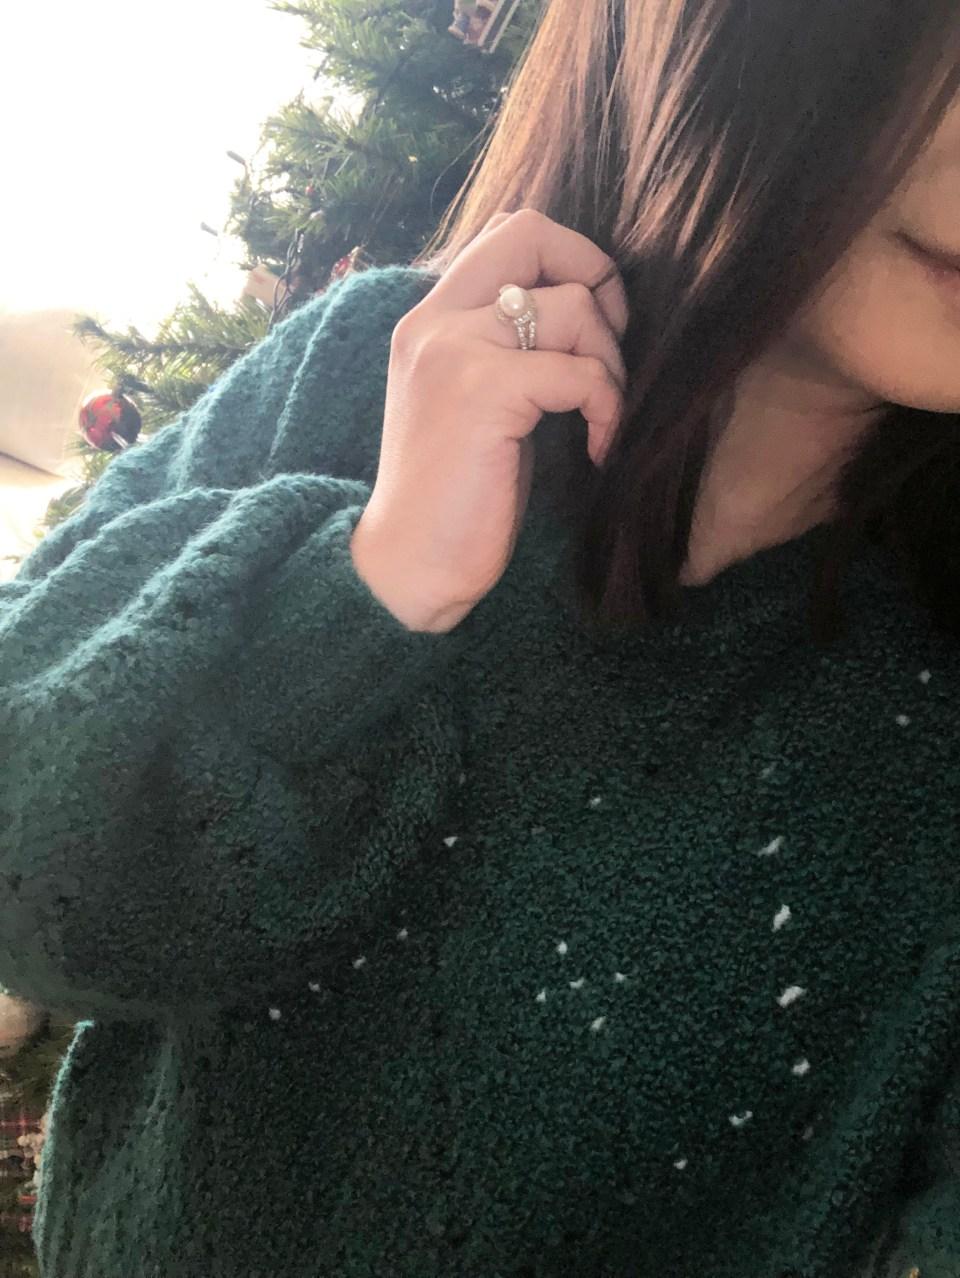 Teal Argyle Sweater 17